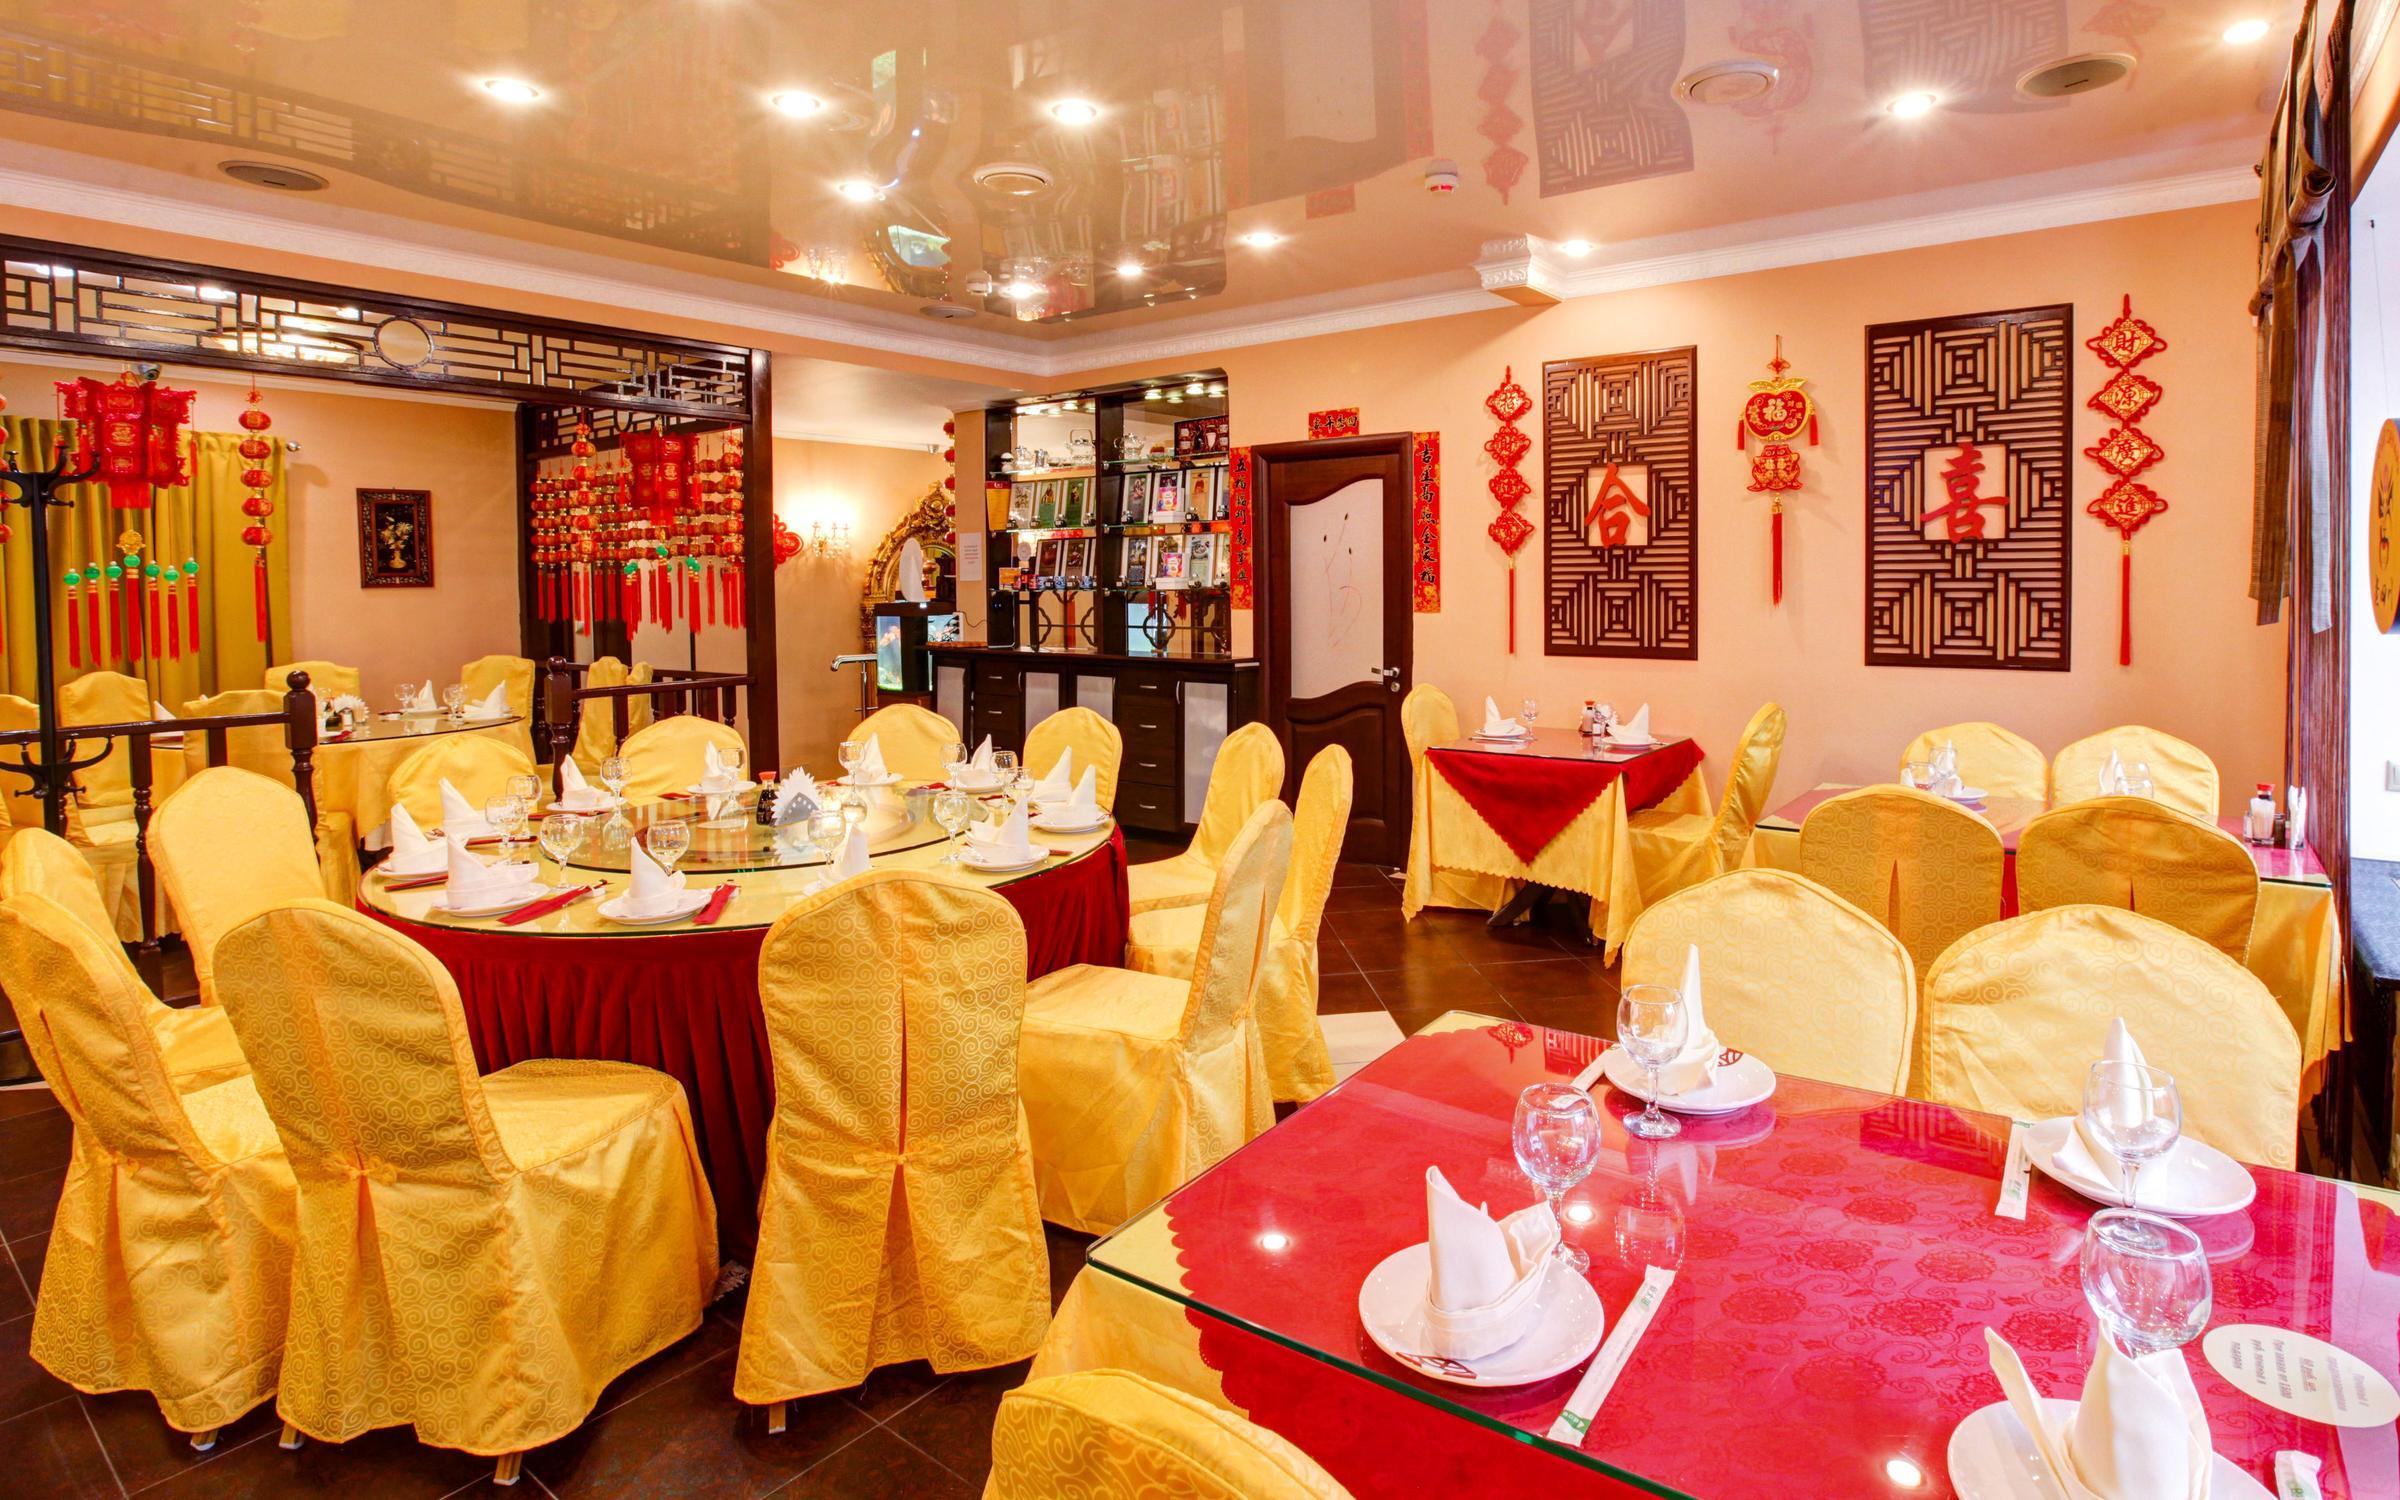 фотография Ресторана Старый Сычуань на метро Китай-город